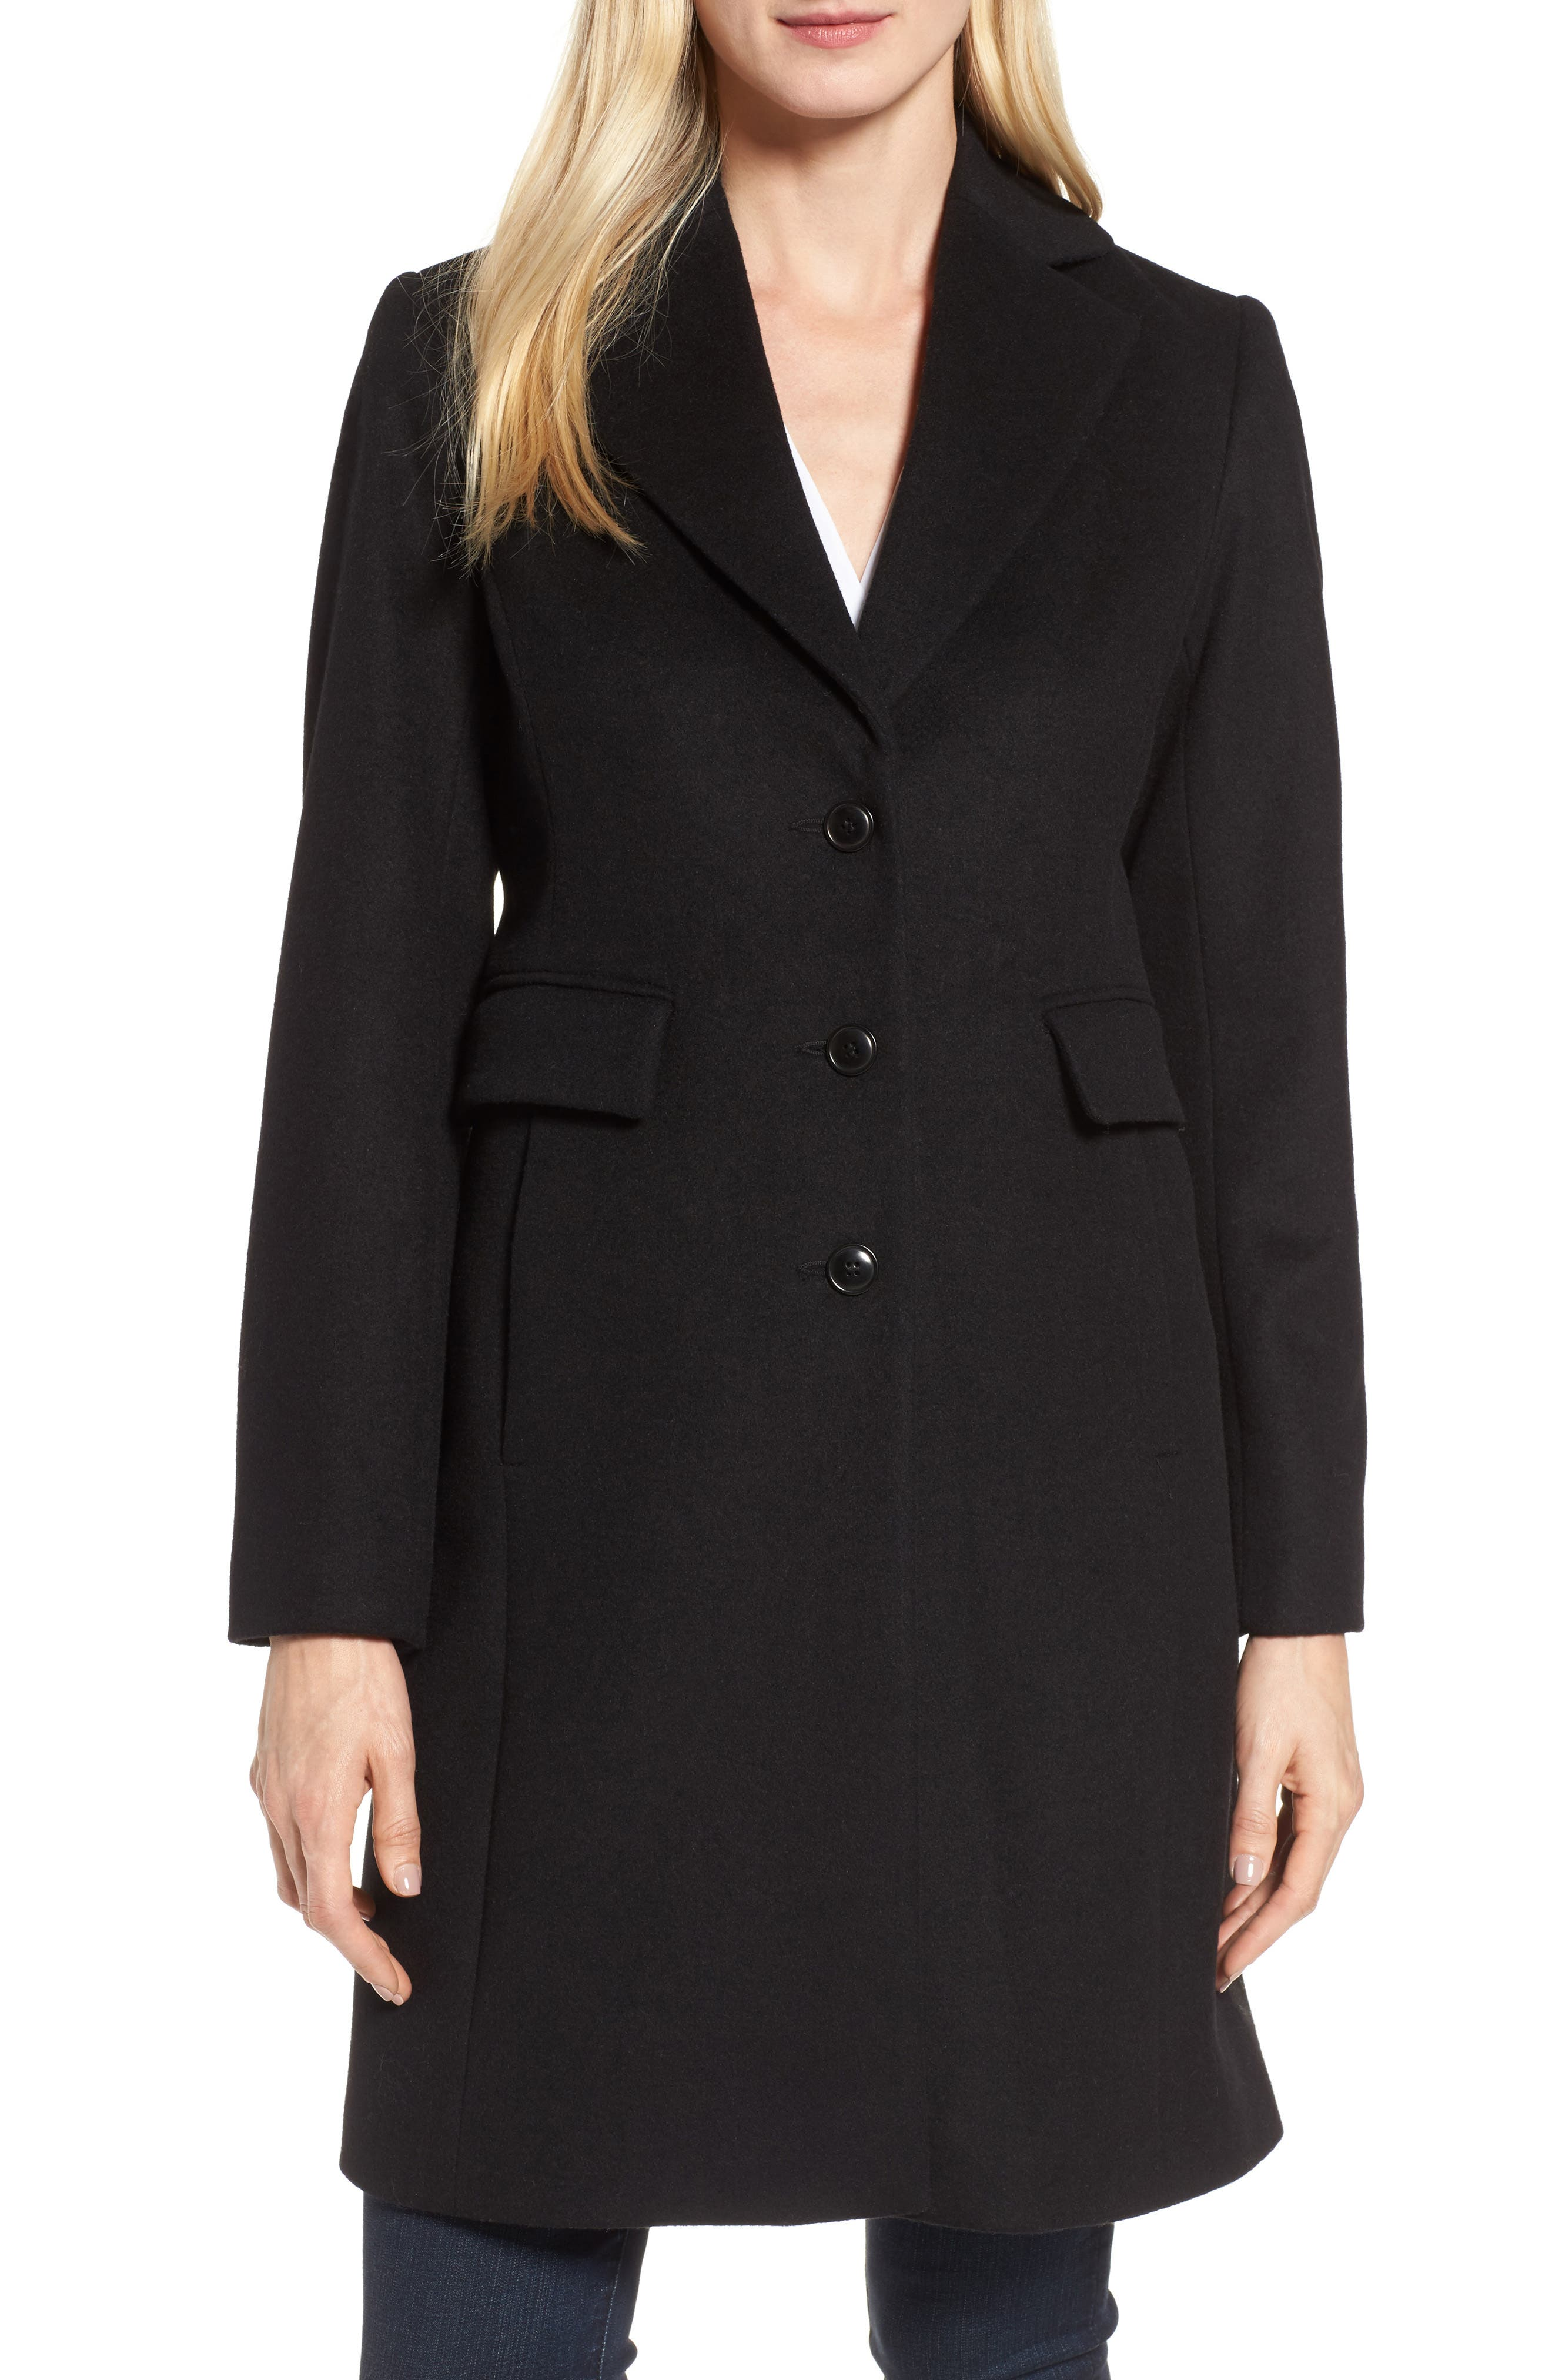 KRISTEN BLAKE Walking Coat, Main, color, BLACK